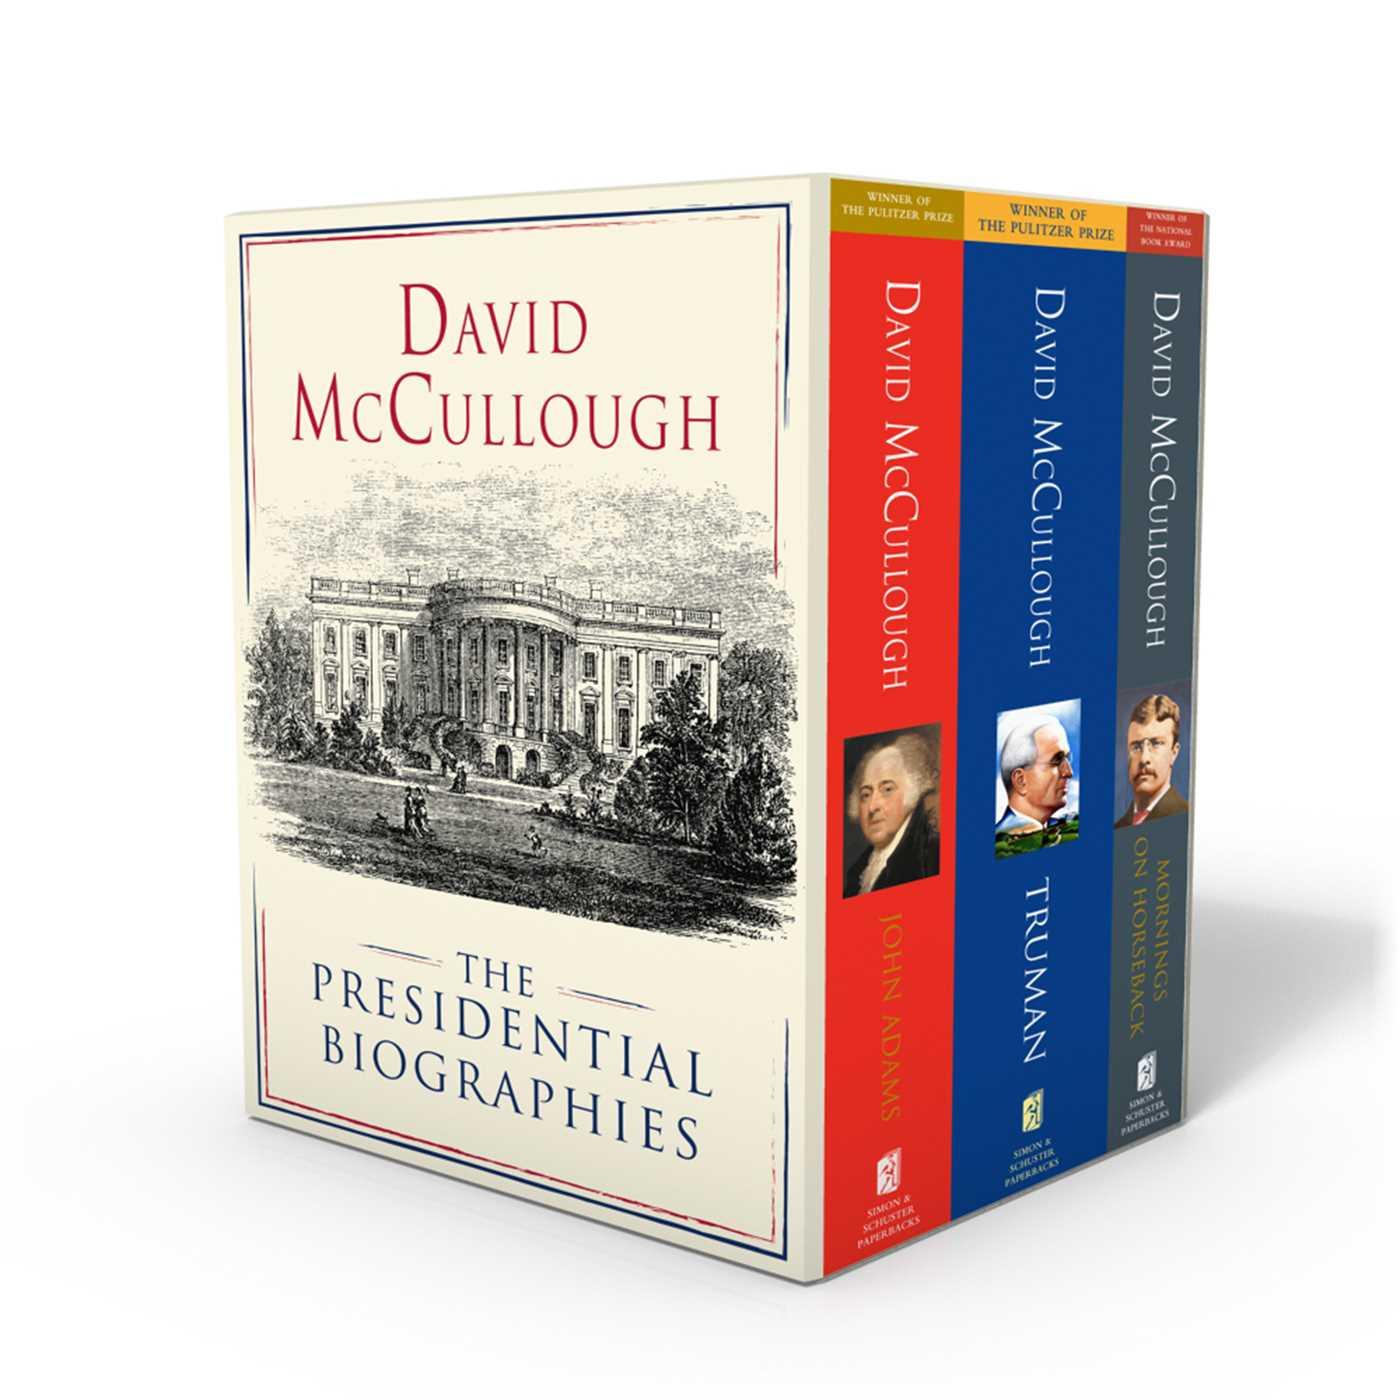 David mccullough the presidential biographies 9781501189029 hr